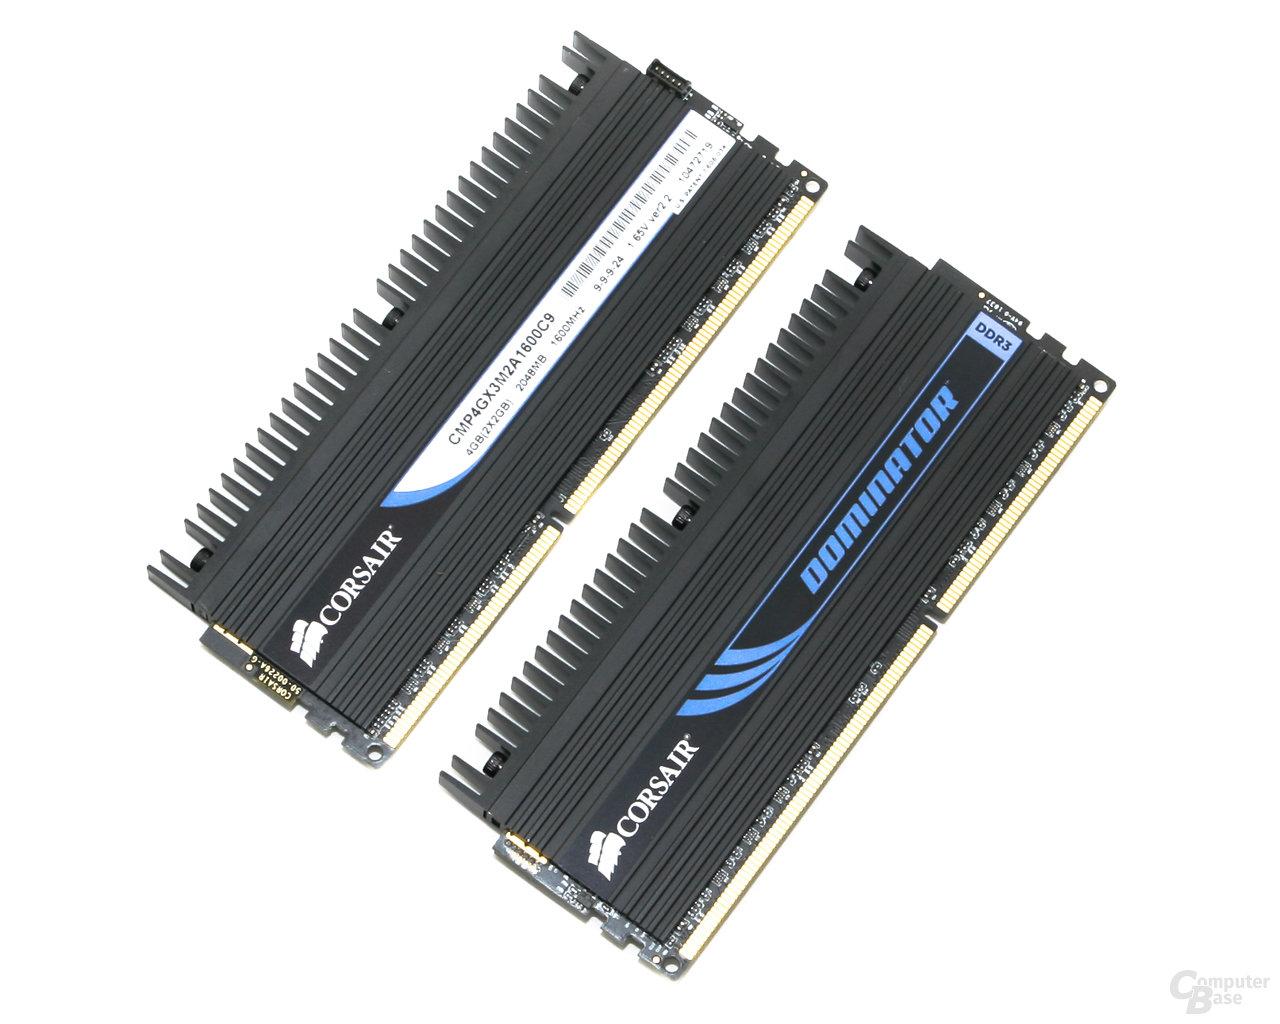 Corsair Dominator DDR3-1600